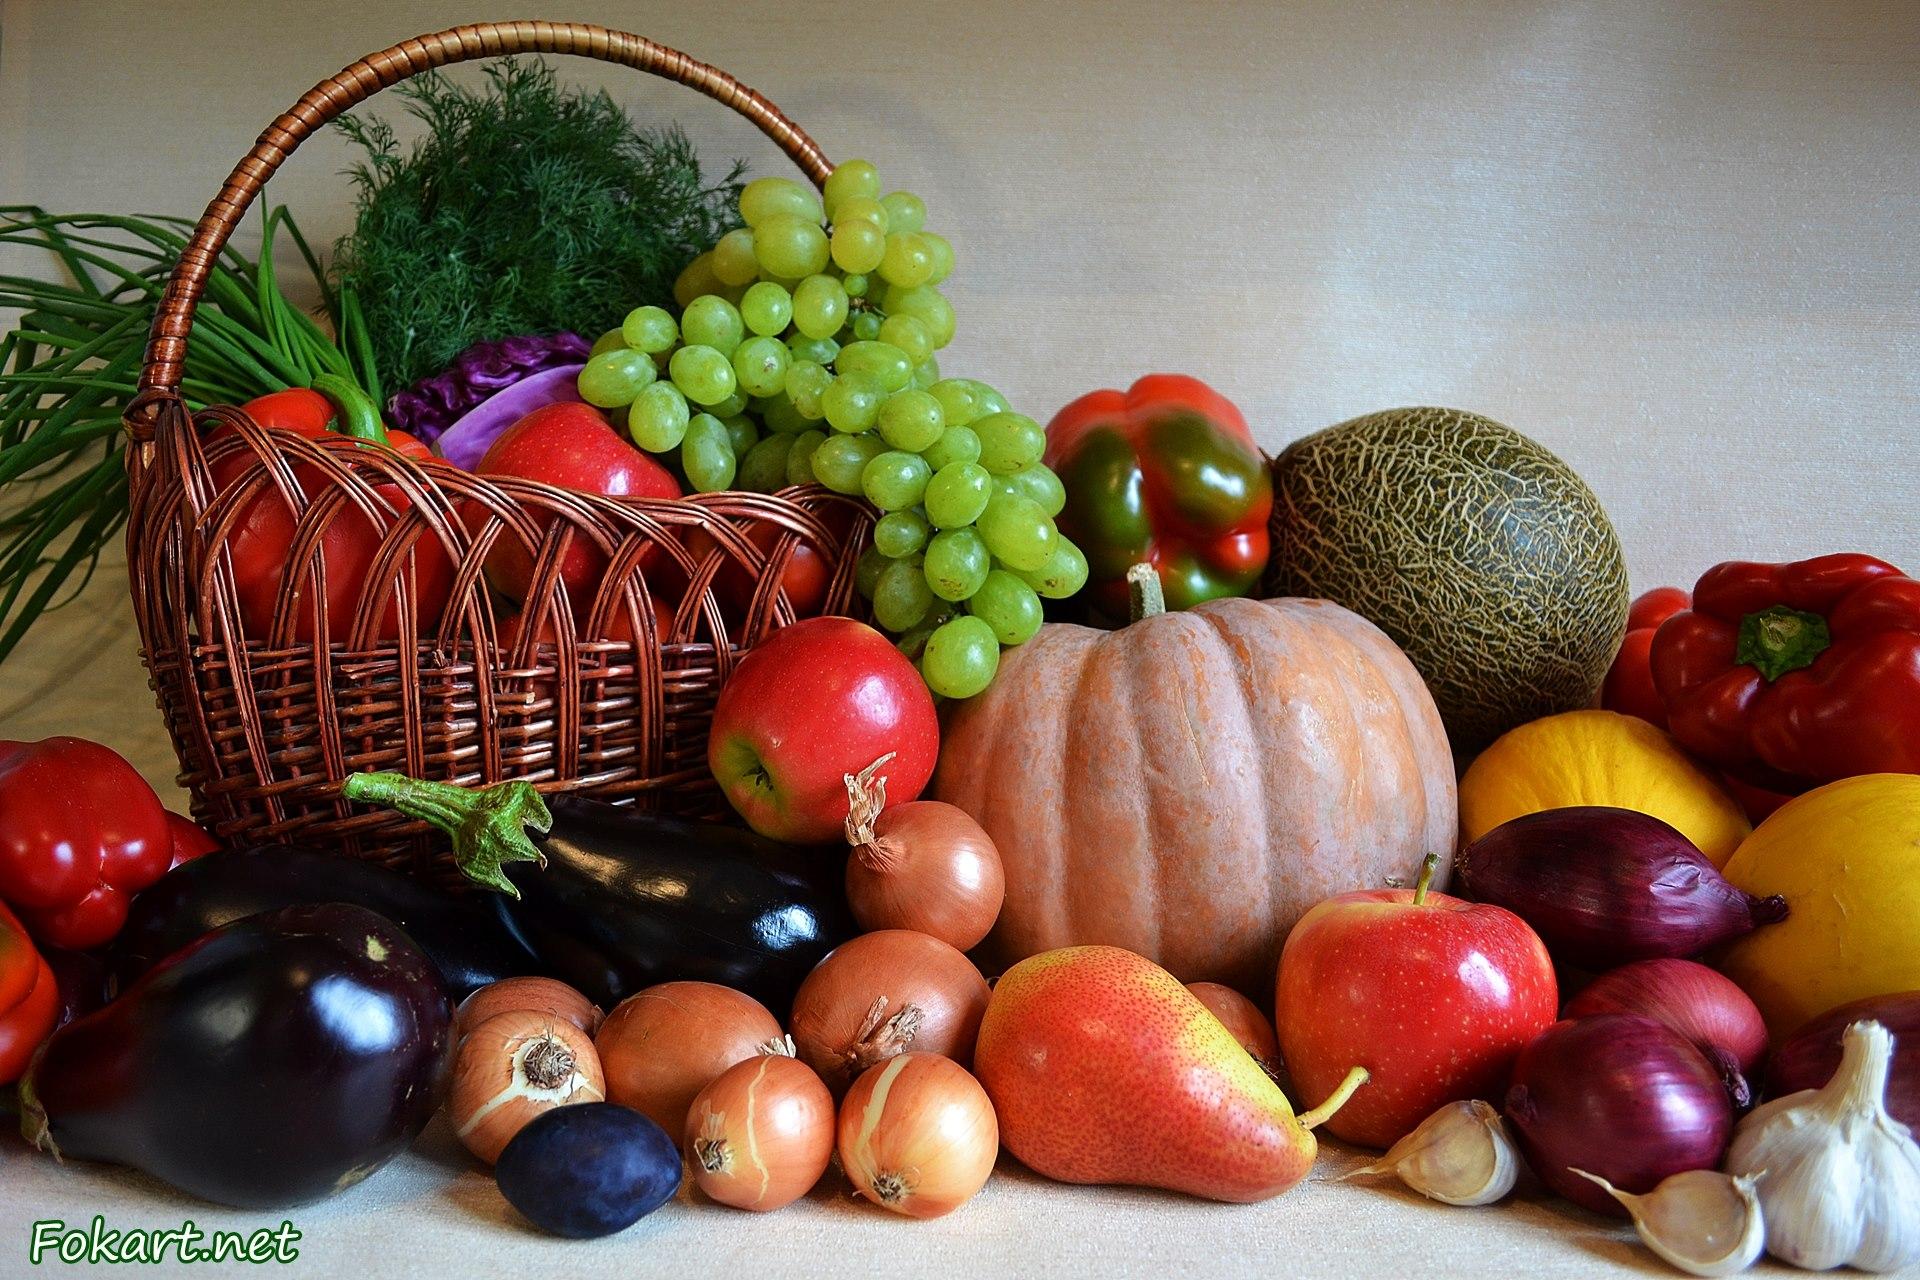 Тыква, дыня, перец, баклажаны, лук, виноград, зелень...